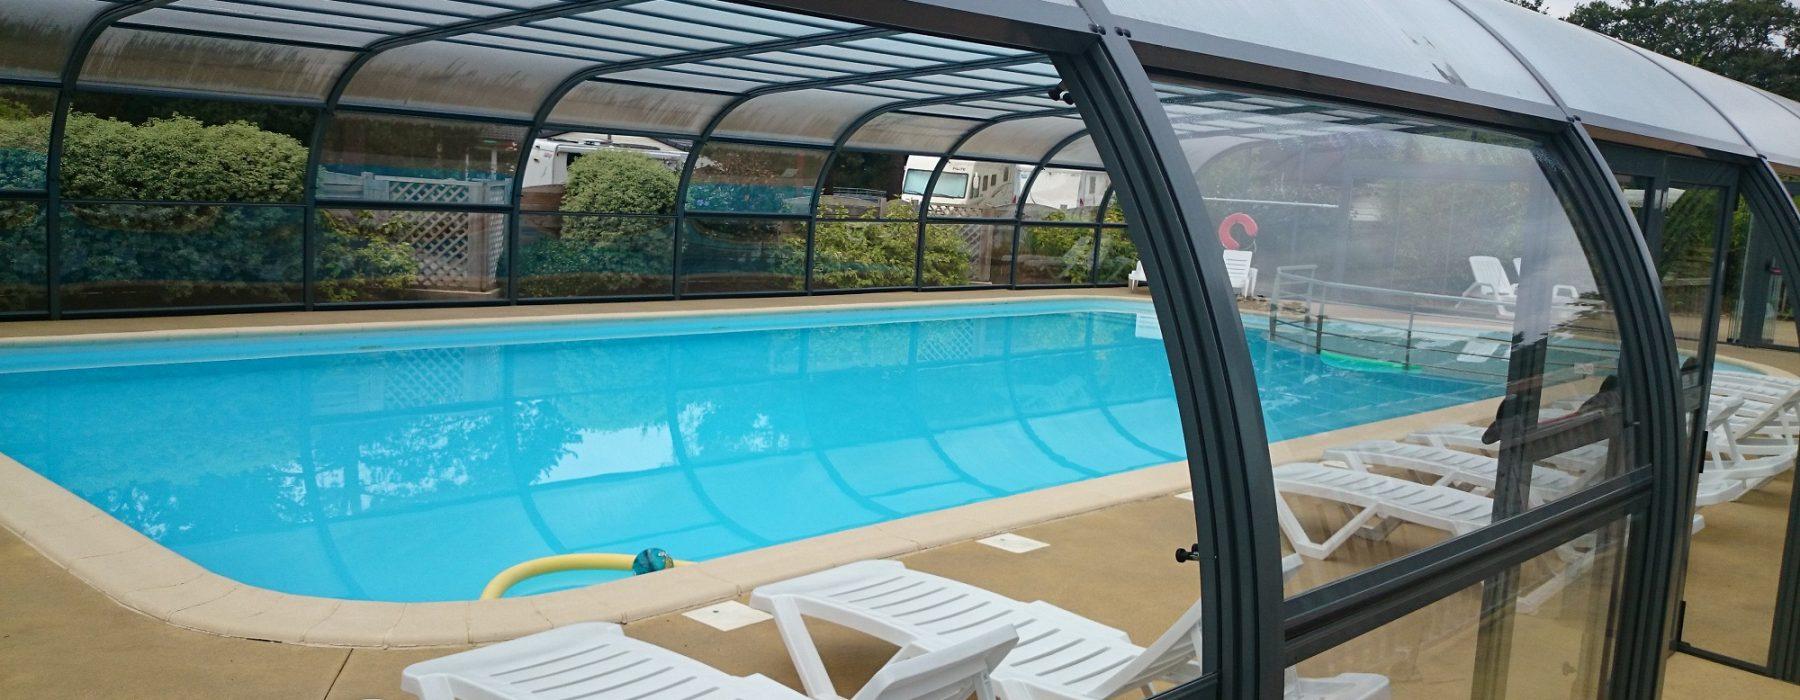 Camping morbihan avec piscine couverte camping entre for Alentour piscine